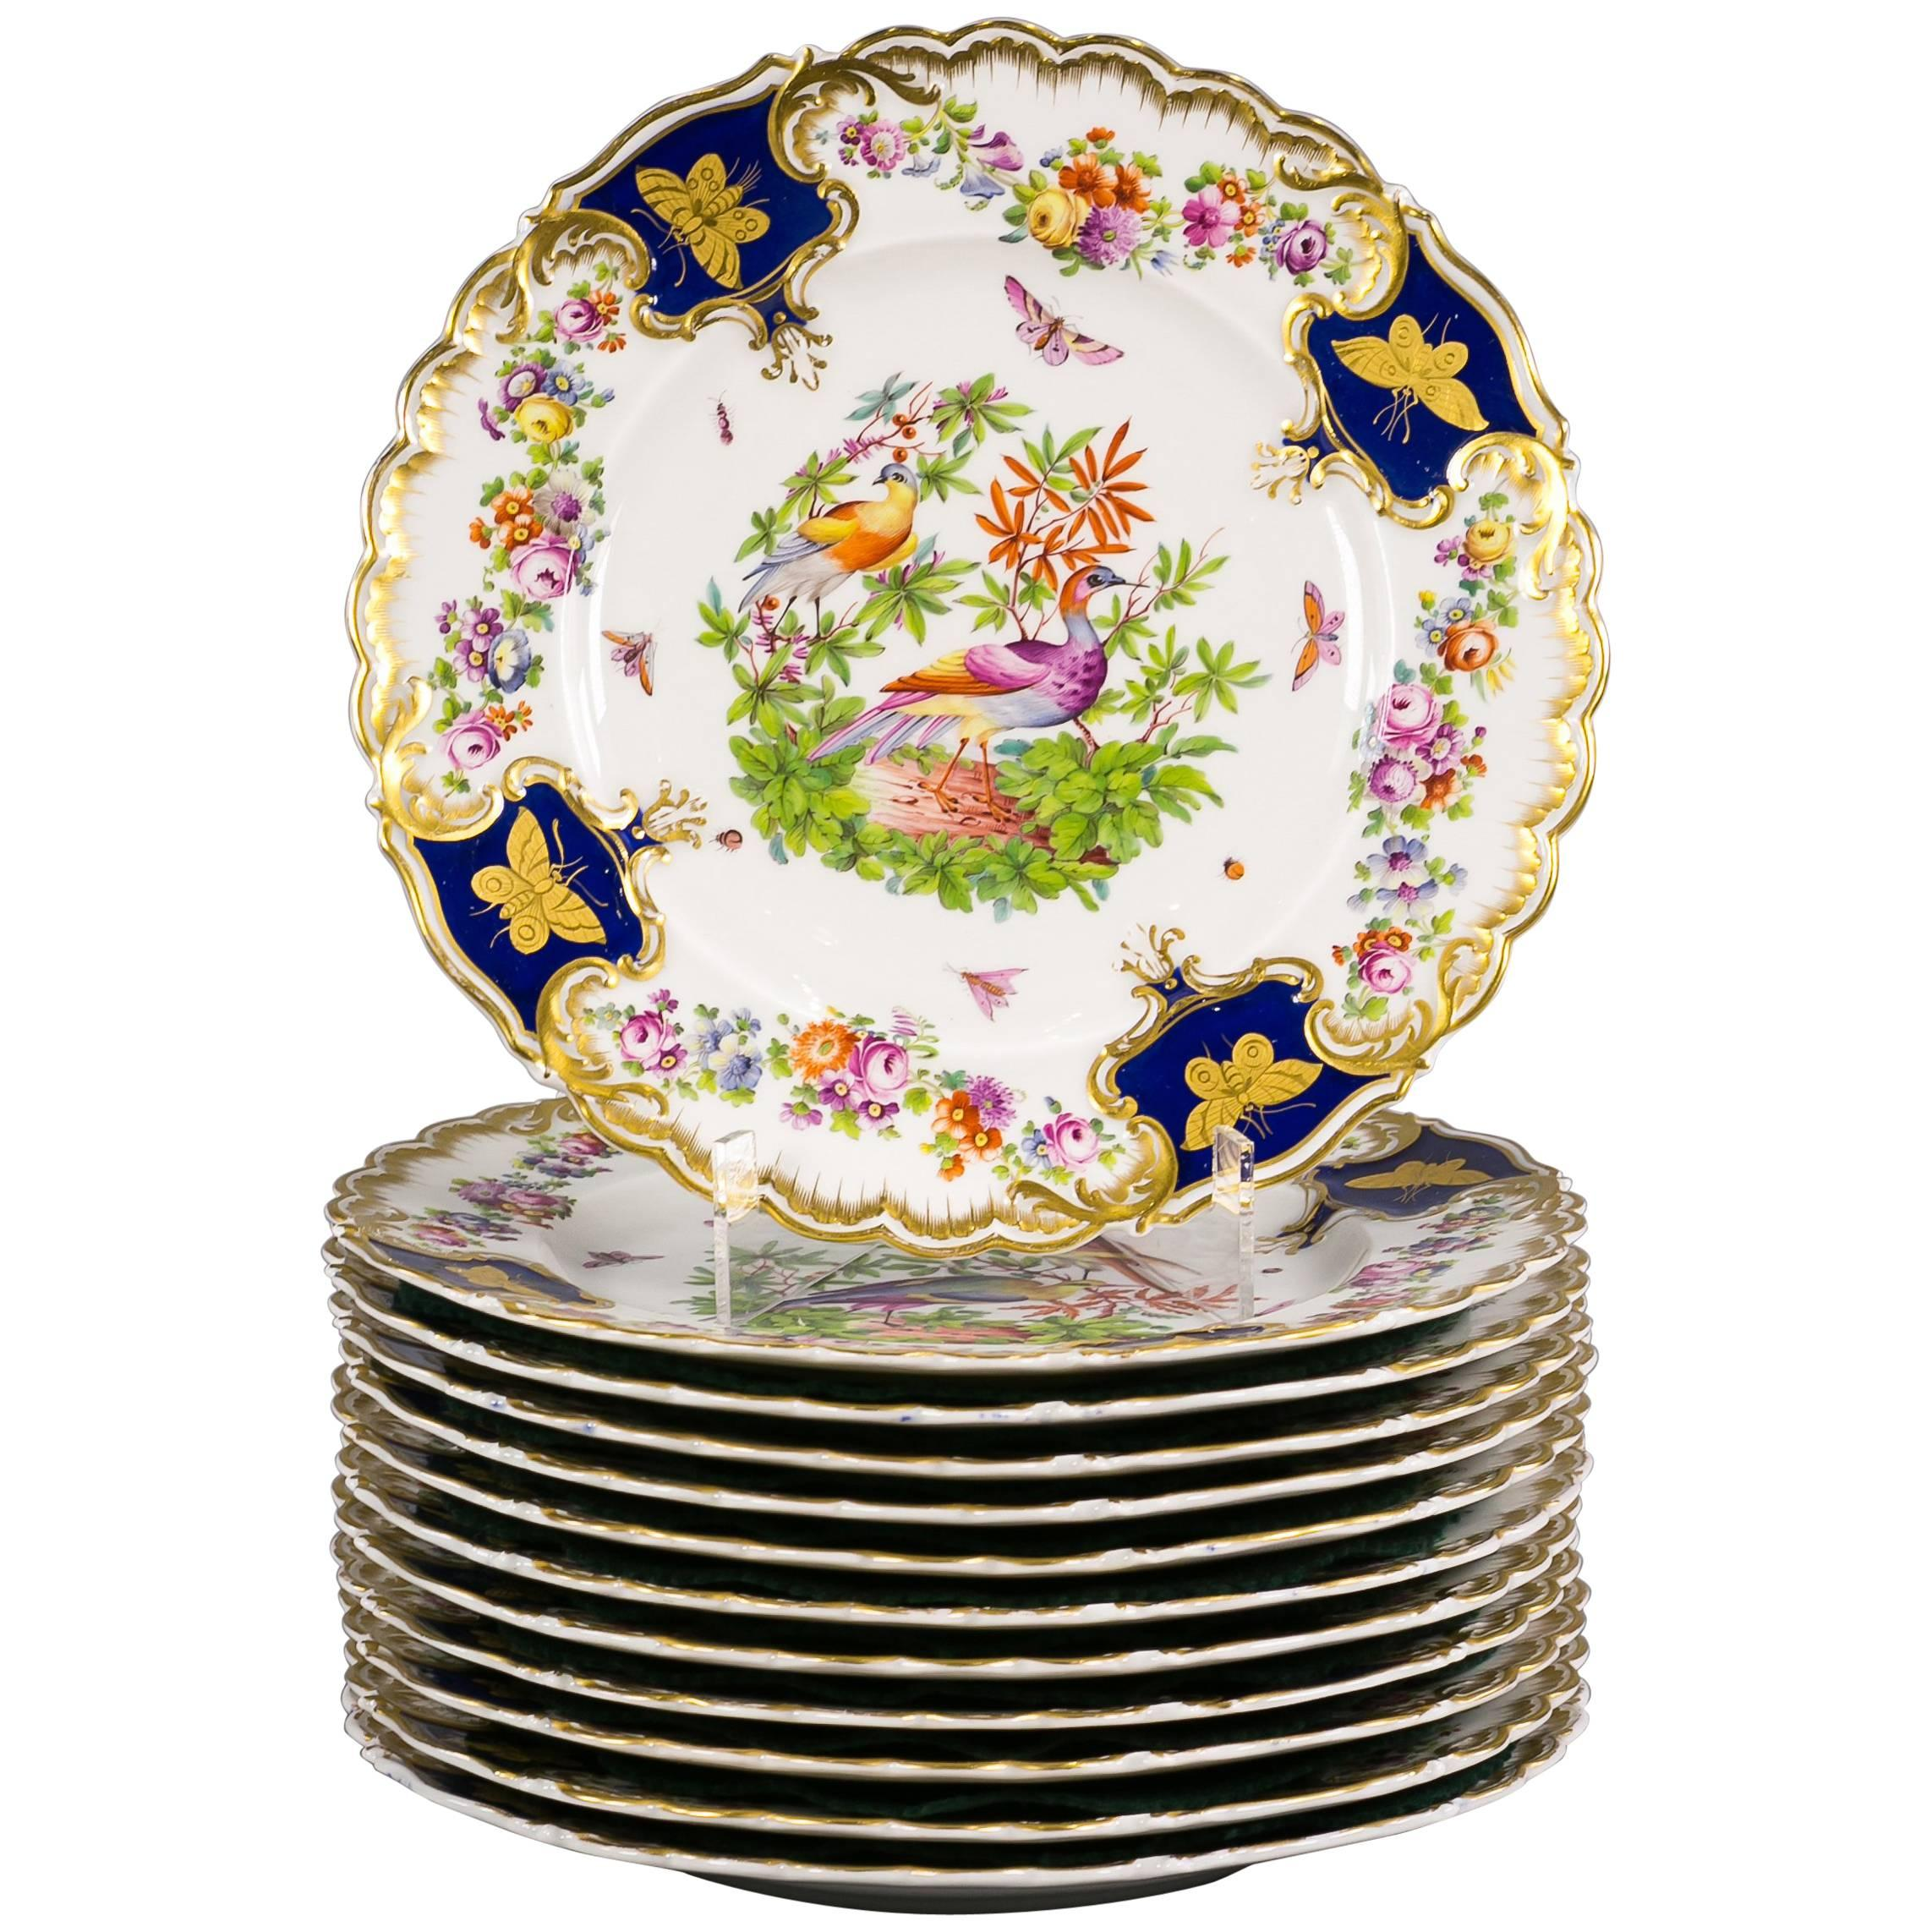 Set of 12 English Porcelain Plates, Coalbrookdale, circa 1850